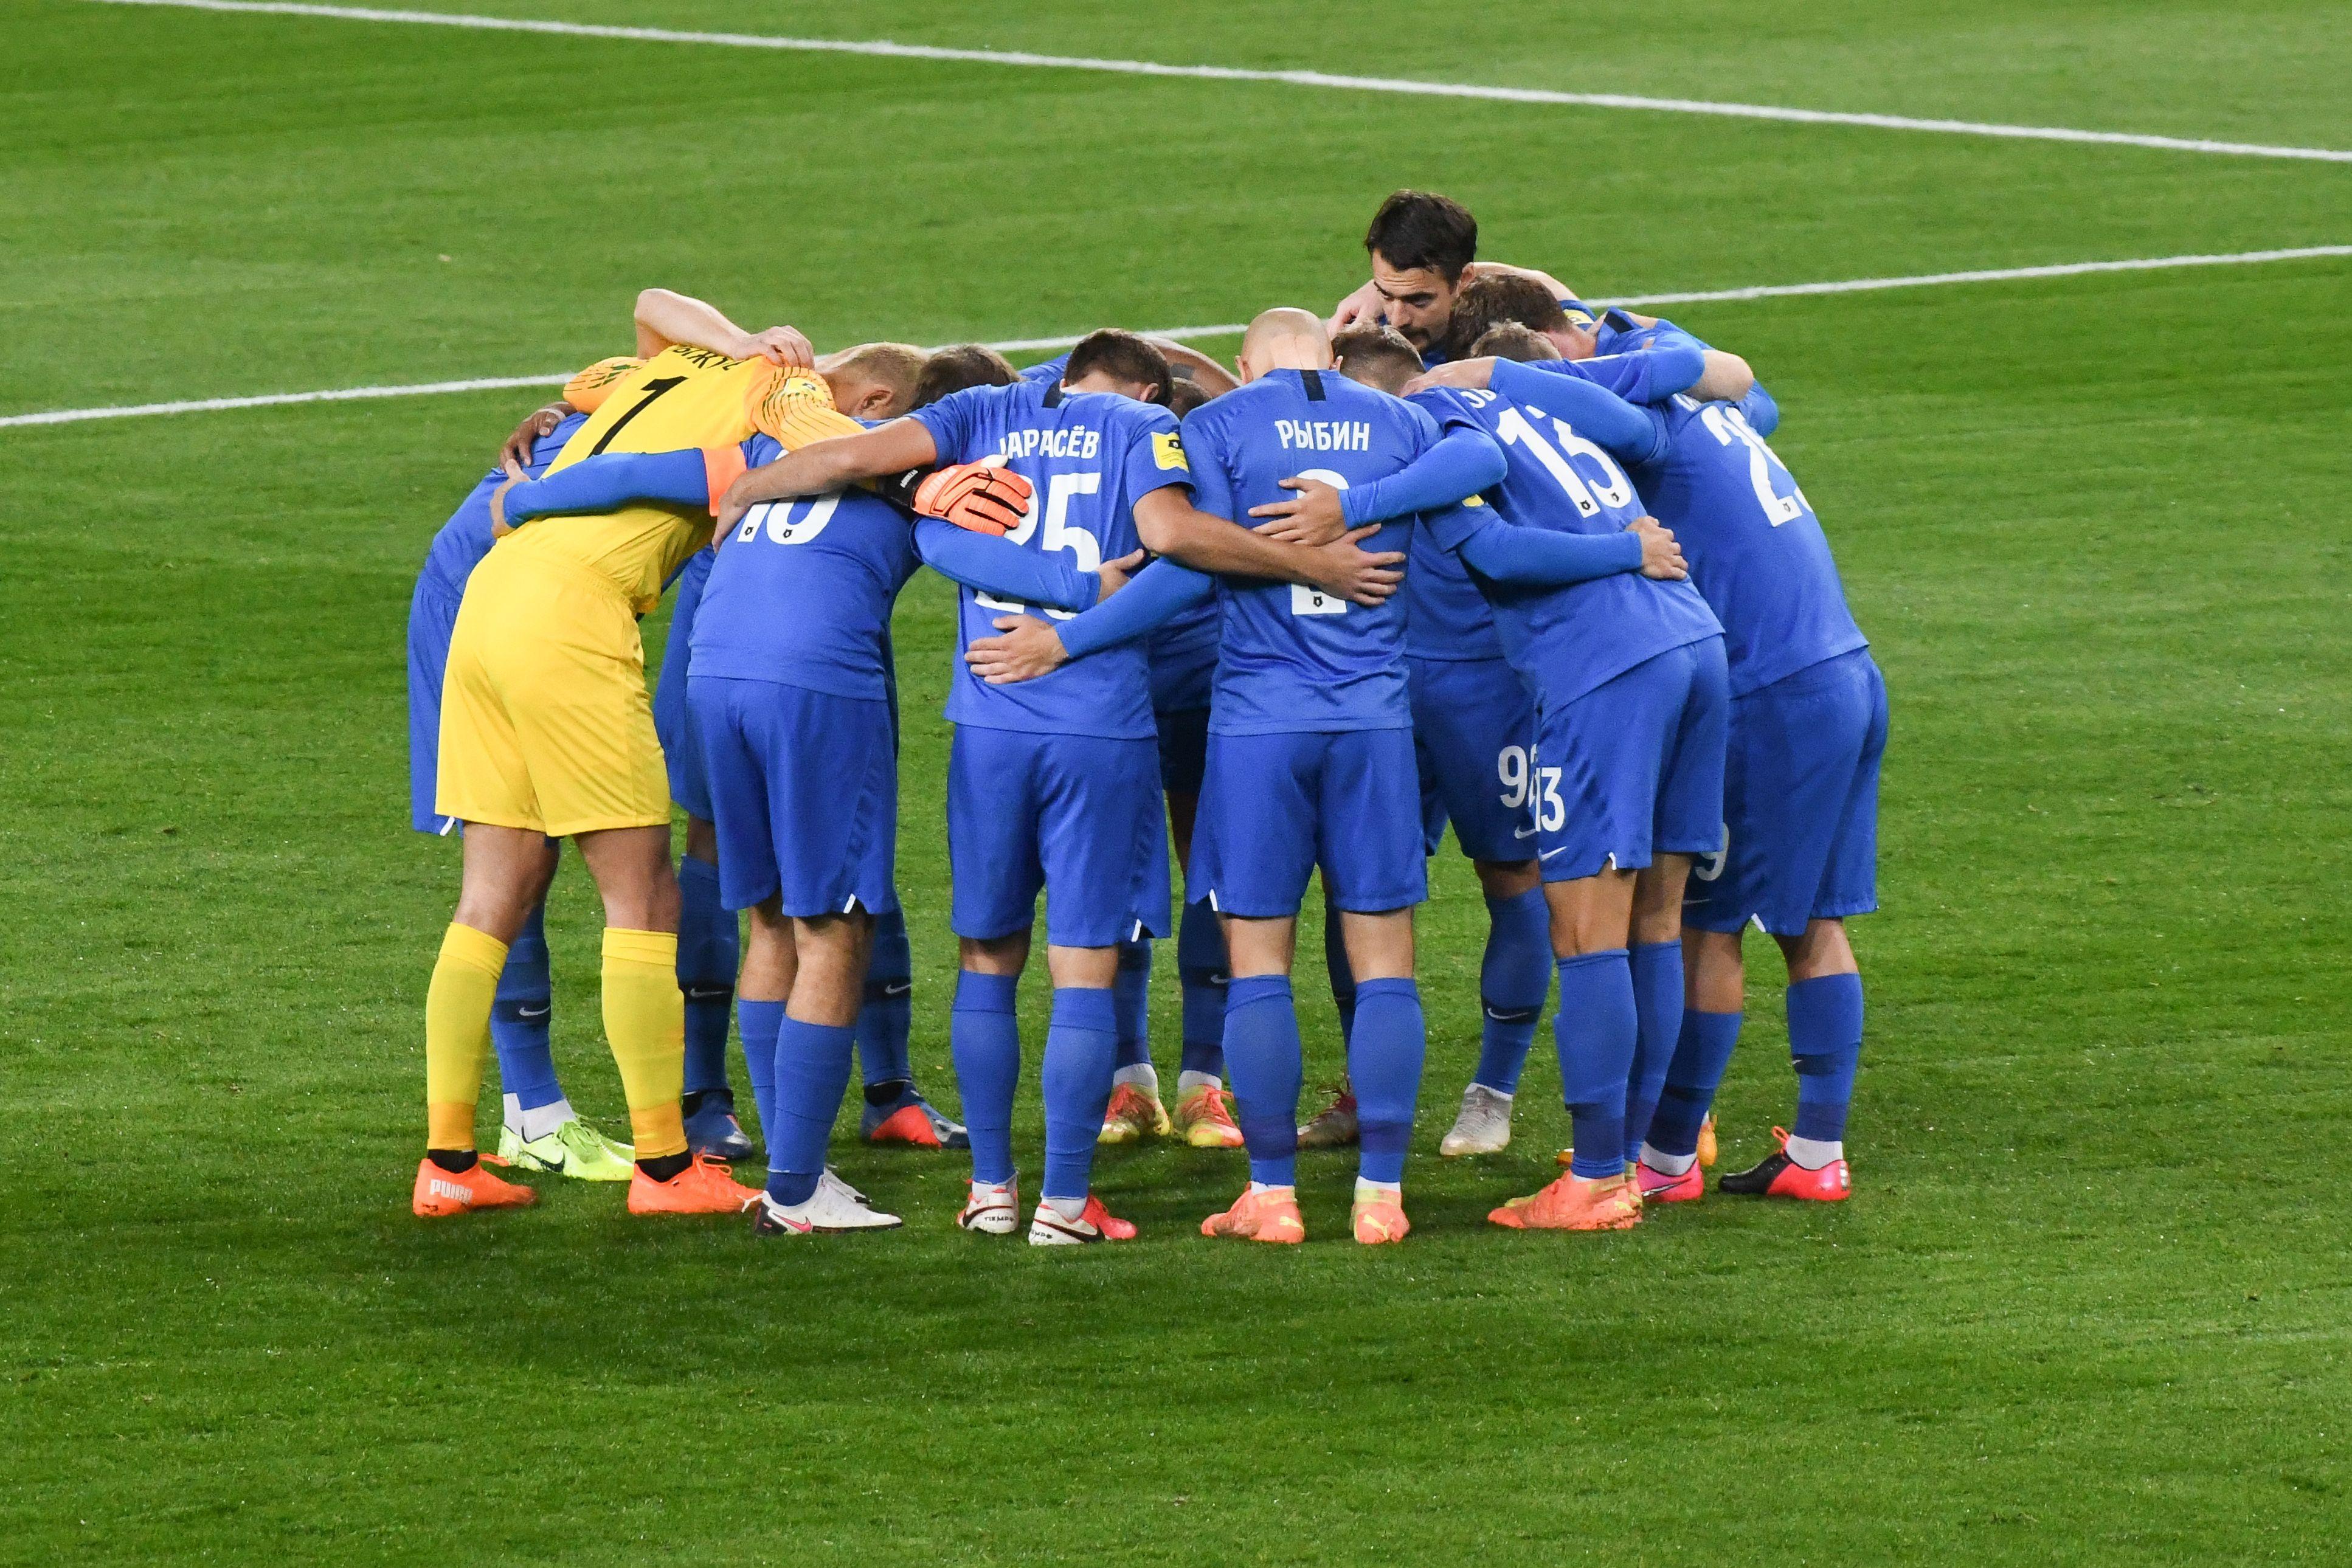 В 'Тамбове' не исключили снятия команды с чемпионата России в январе